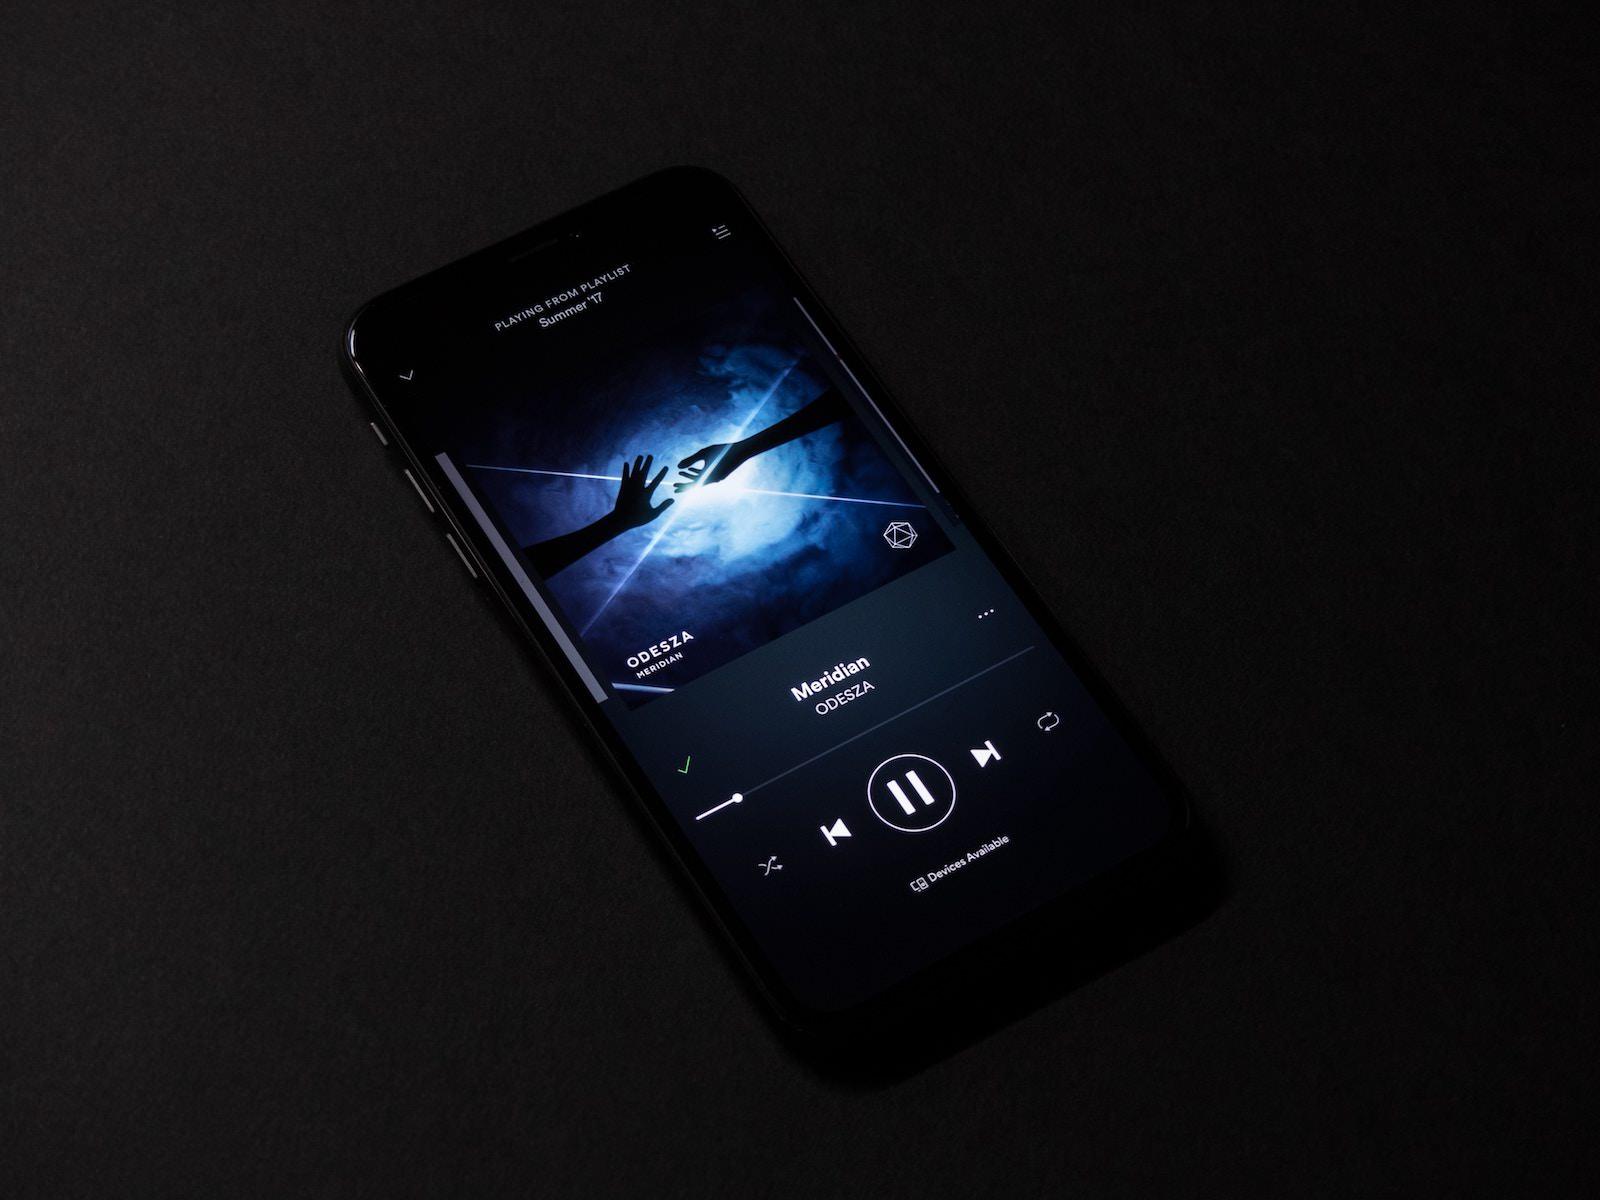 tyler-lastovich-453182-unsplash-Spotify.jpg